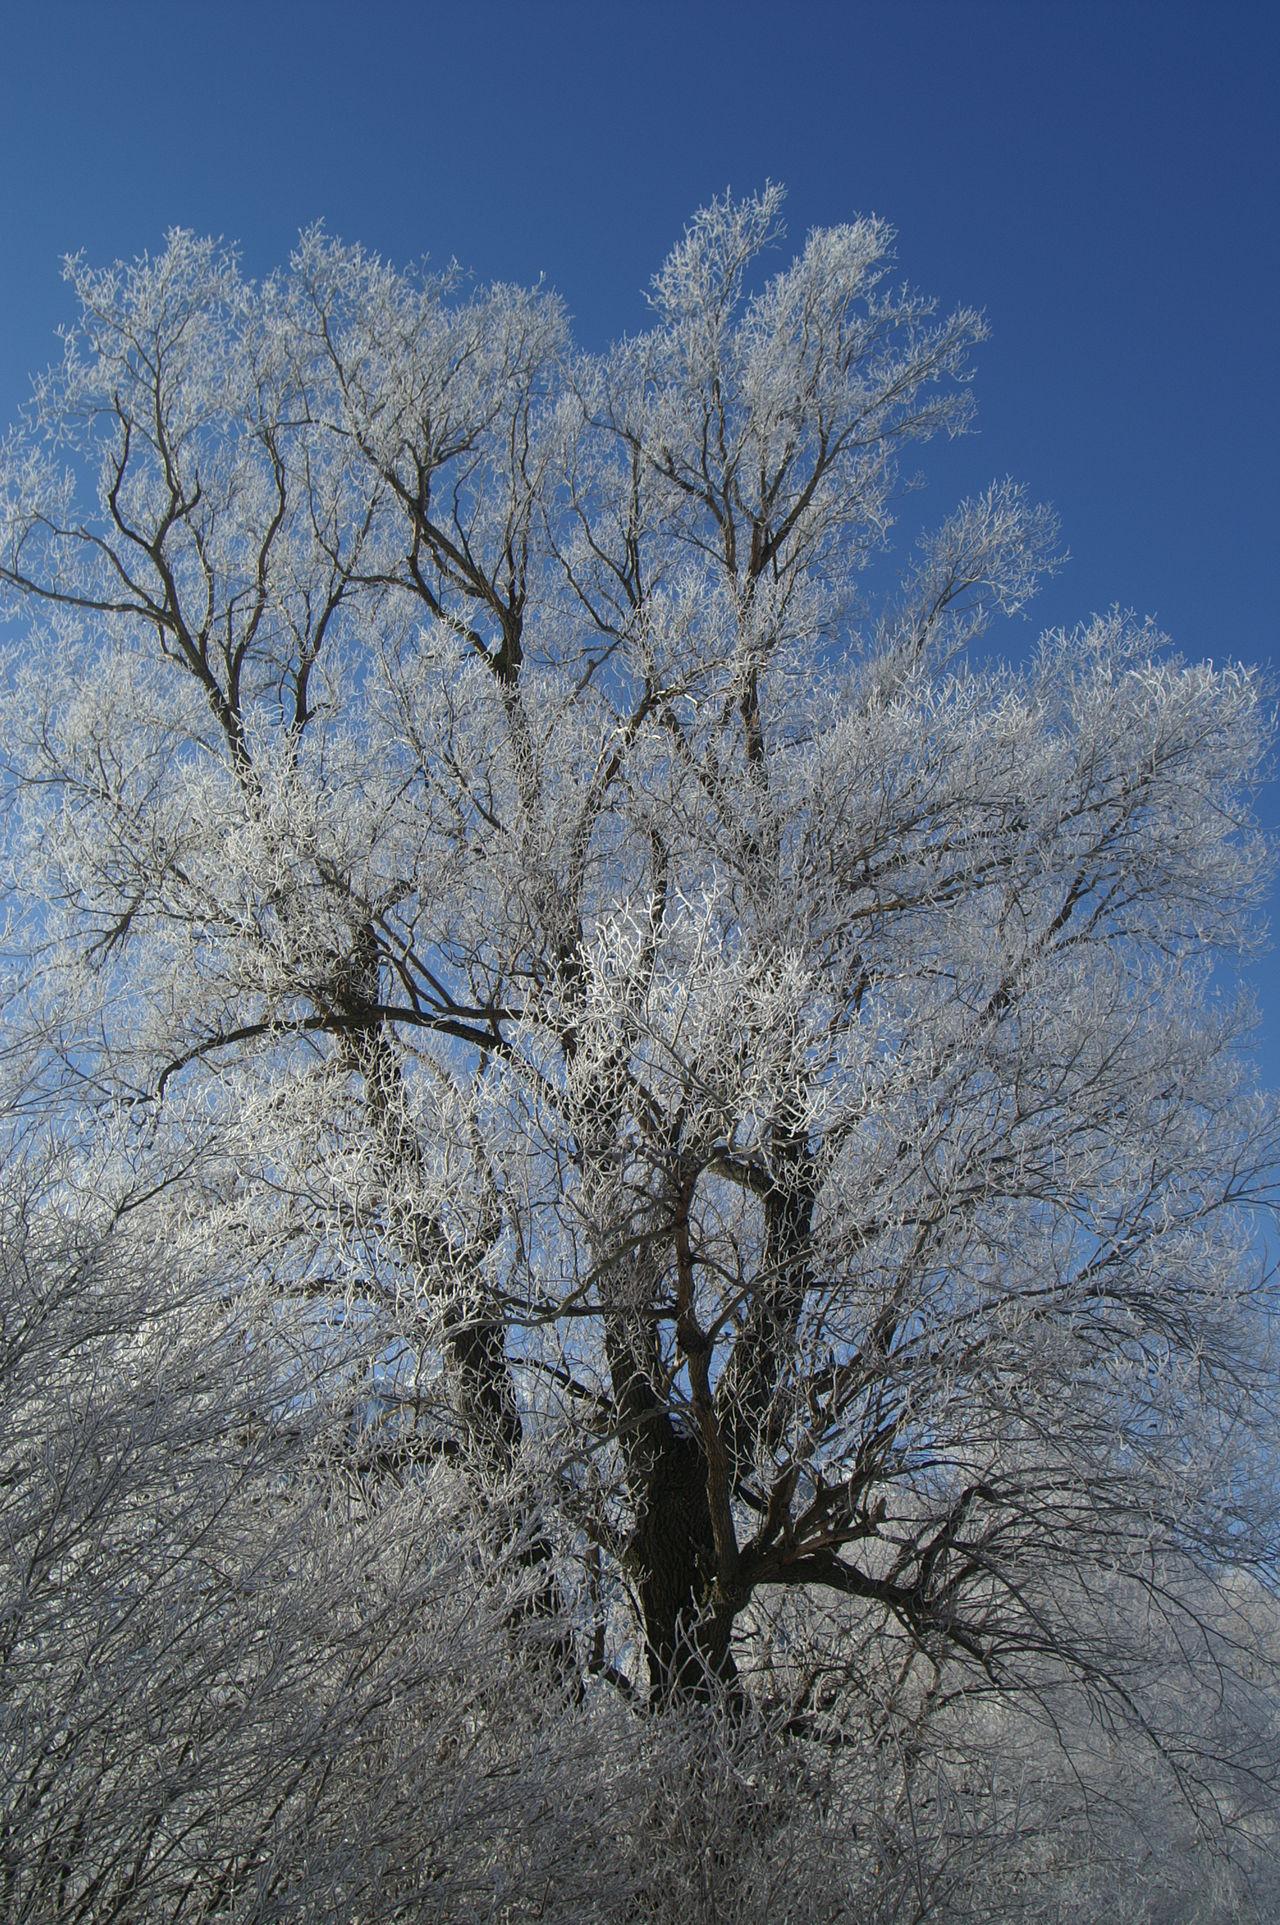 Schweiz Switzerland Wallis Leuk The Magic Mission Wintertime Winter Wonderland Nature Winter Trees Blue Sky Blauer Himmel Kalt Cold Cold Temperature